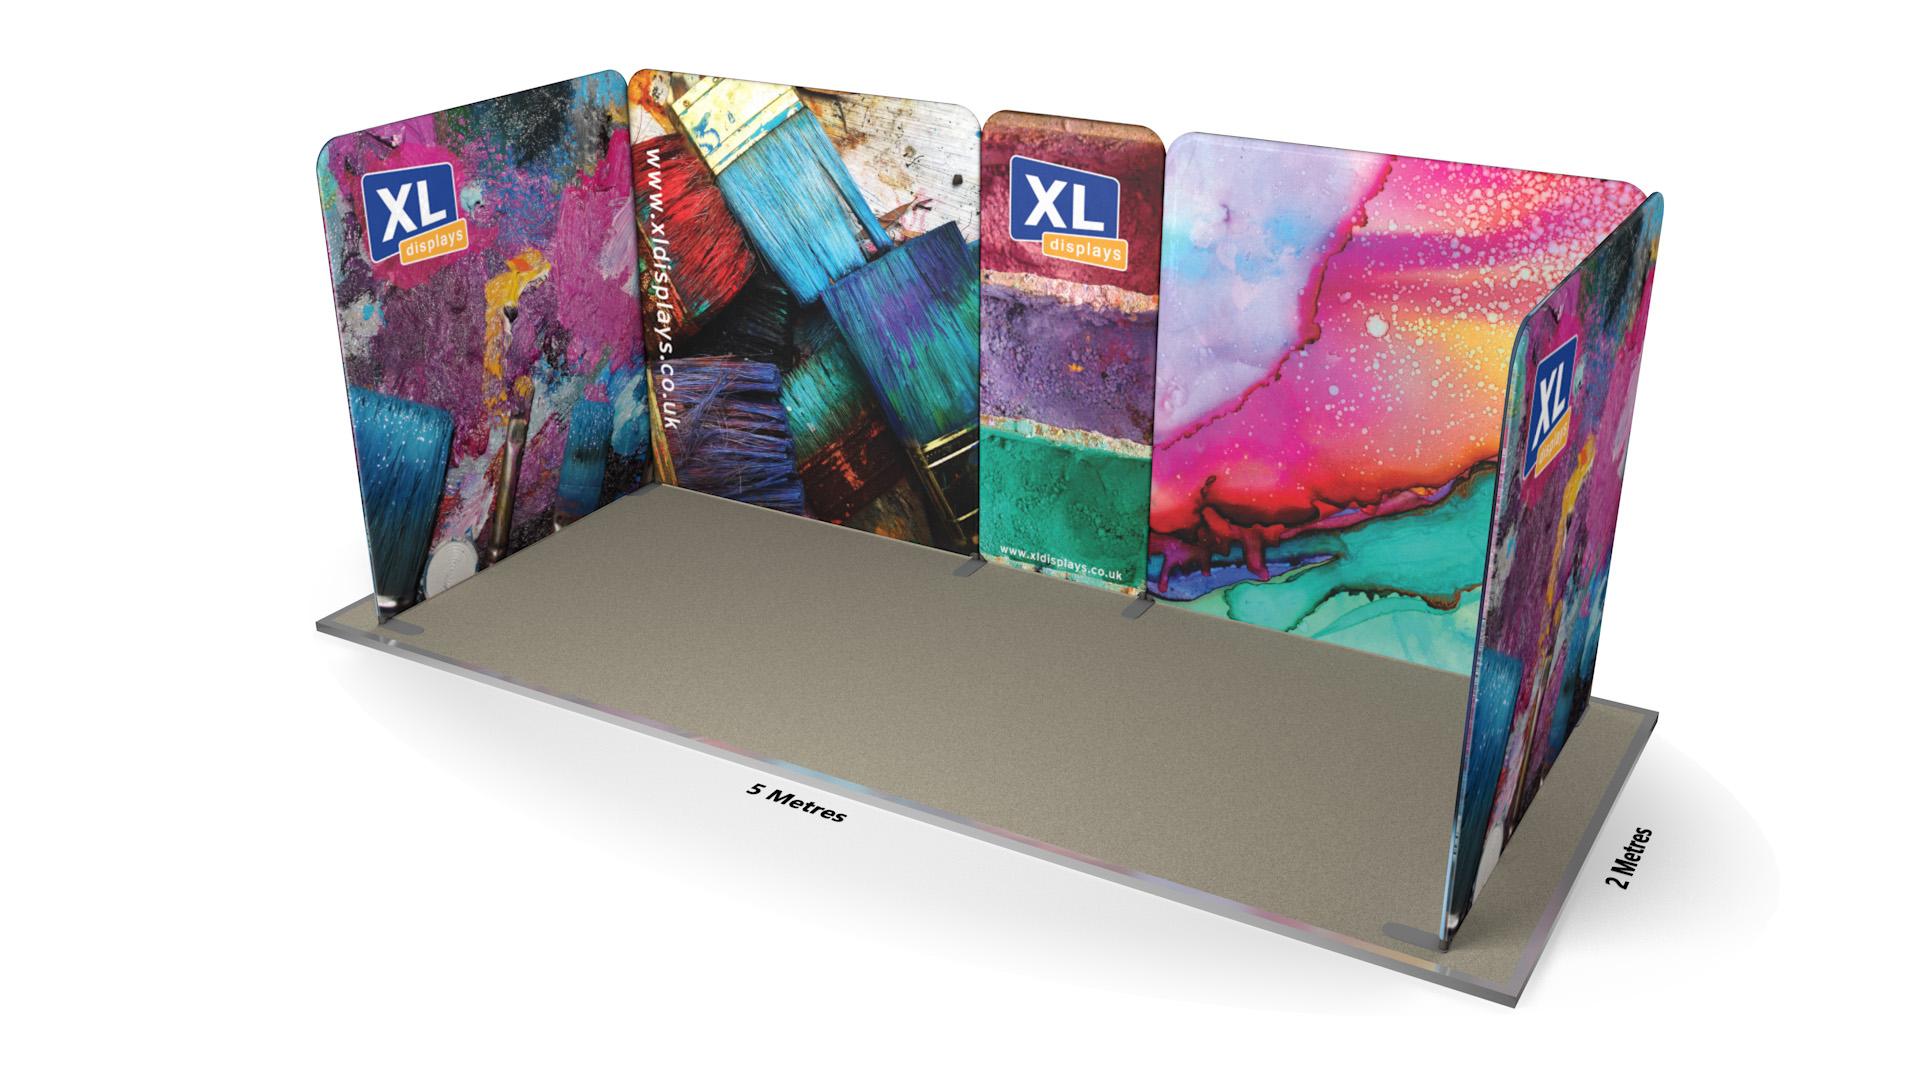 Modulate<sup>™</sup> 5m x 2m U-Shaped Fabric Booth